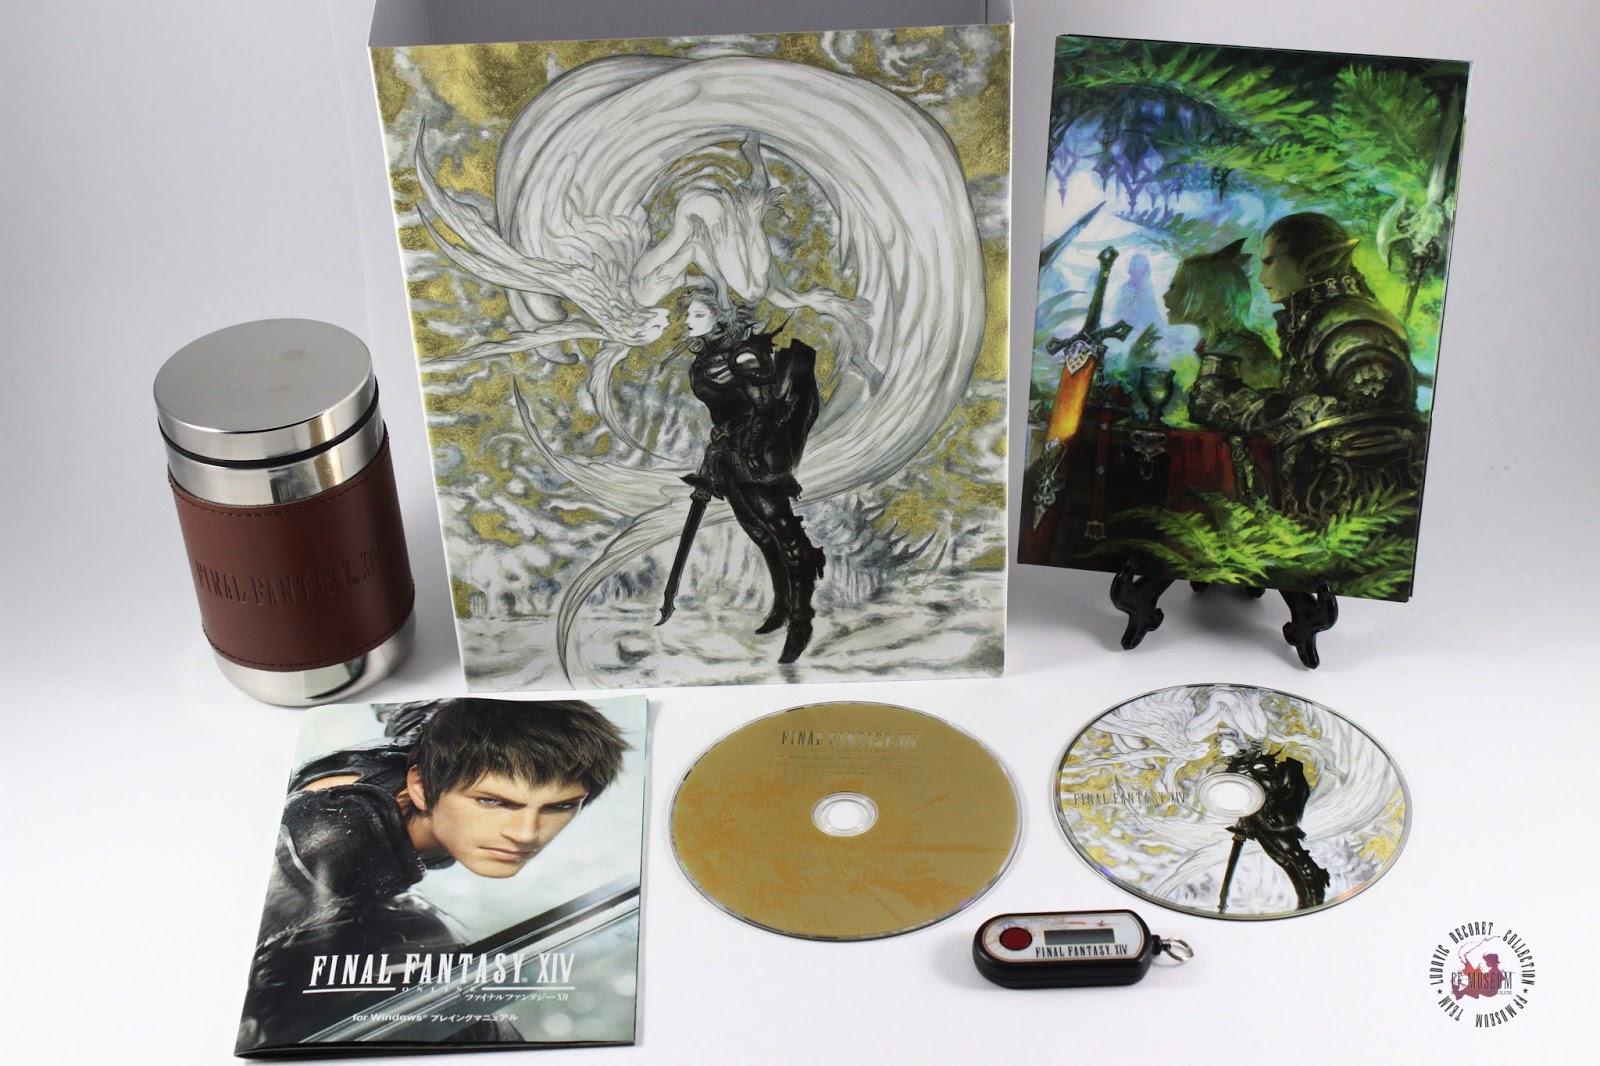 Final Fantasy XIV 1 0 Collector's edition Jap   FF MUSEUM